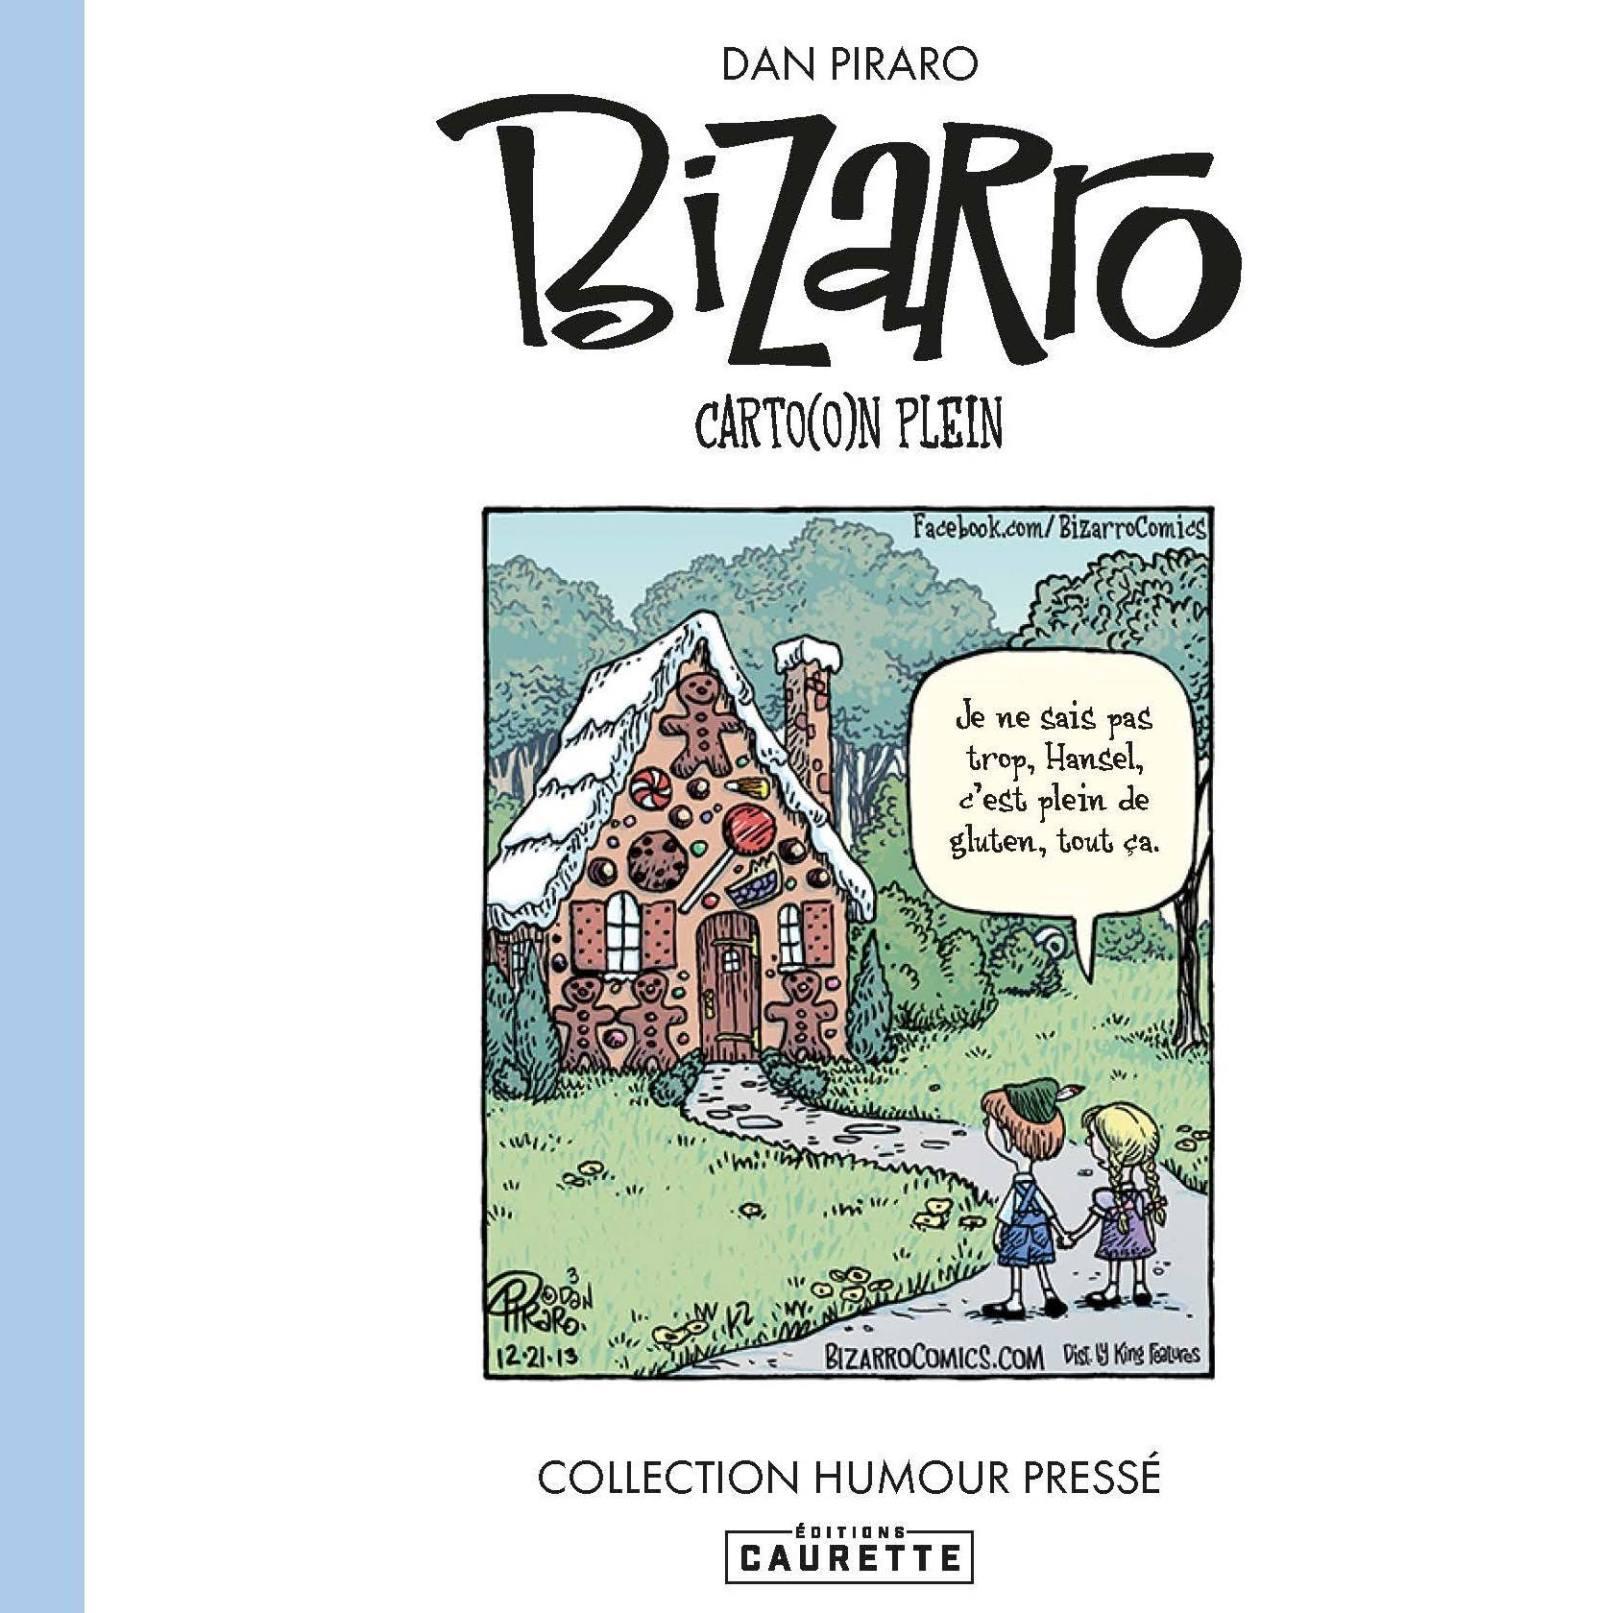 Couverture de la bd humoristique Bizarro Carton plein de Dan Piraro.